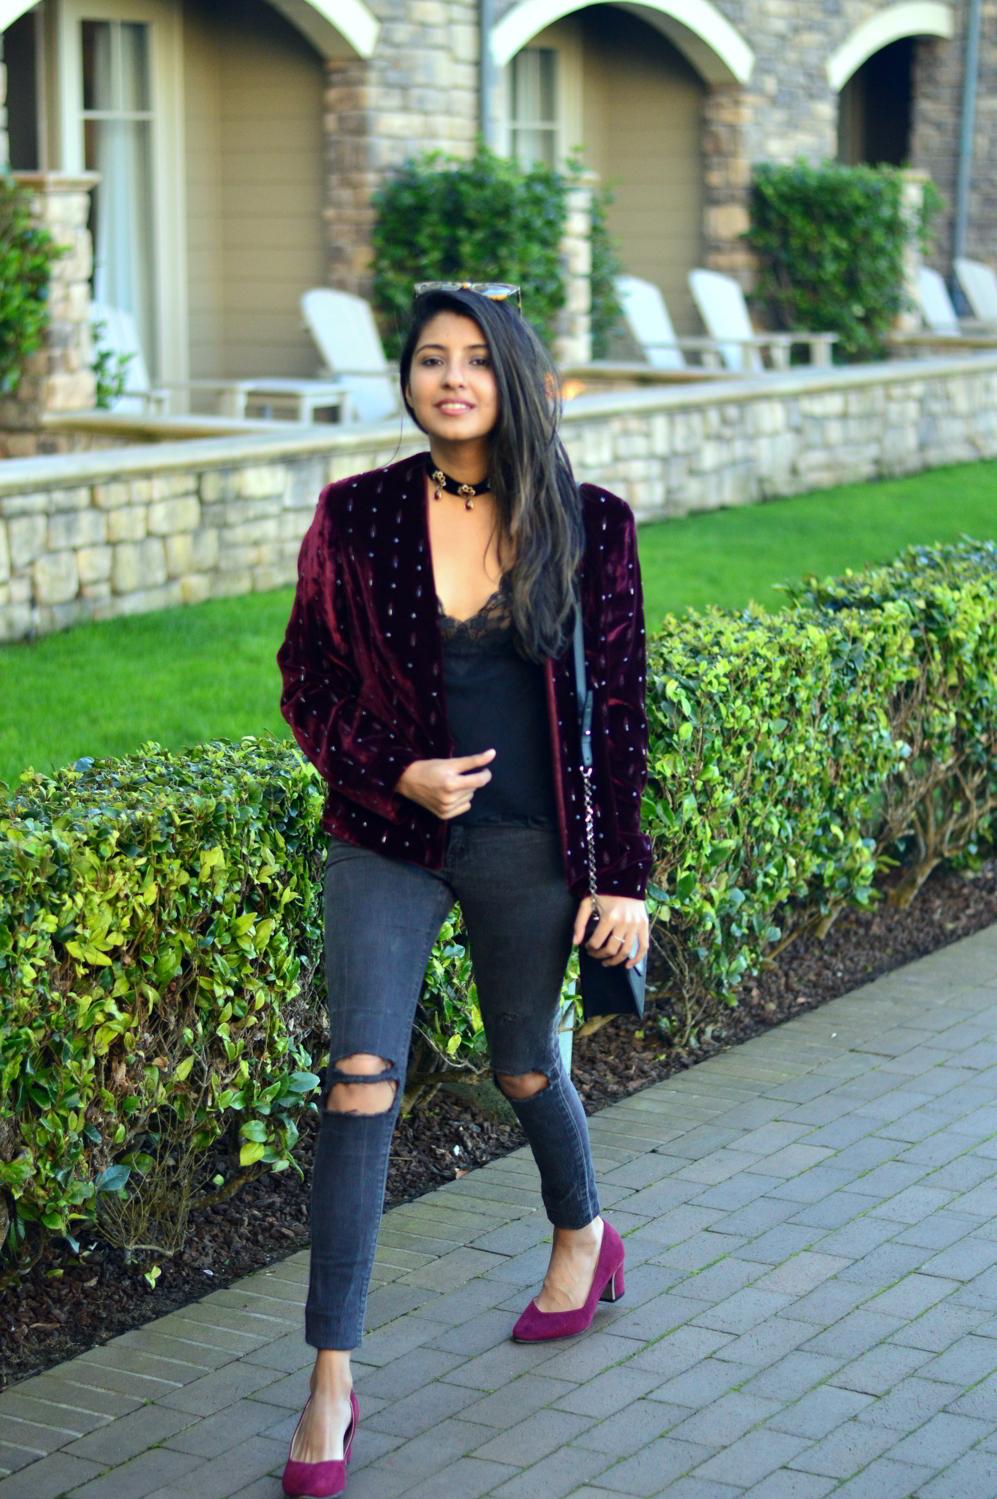 velvet-embellished-blazer-holiday-party-style-burgundy-black-blogger-outfit 8